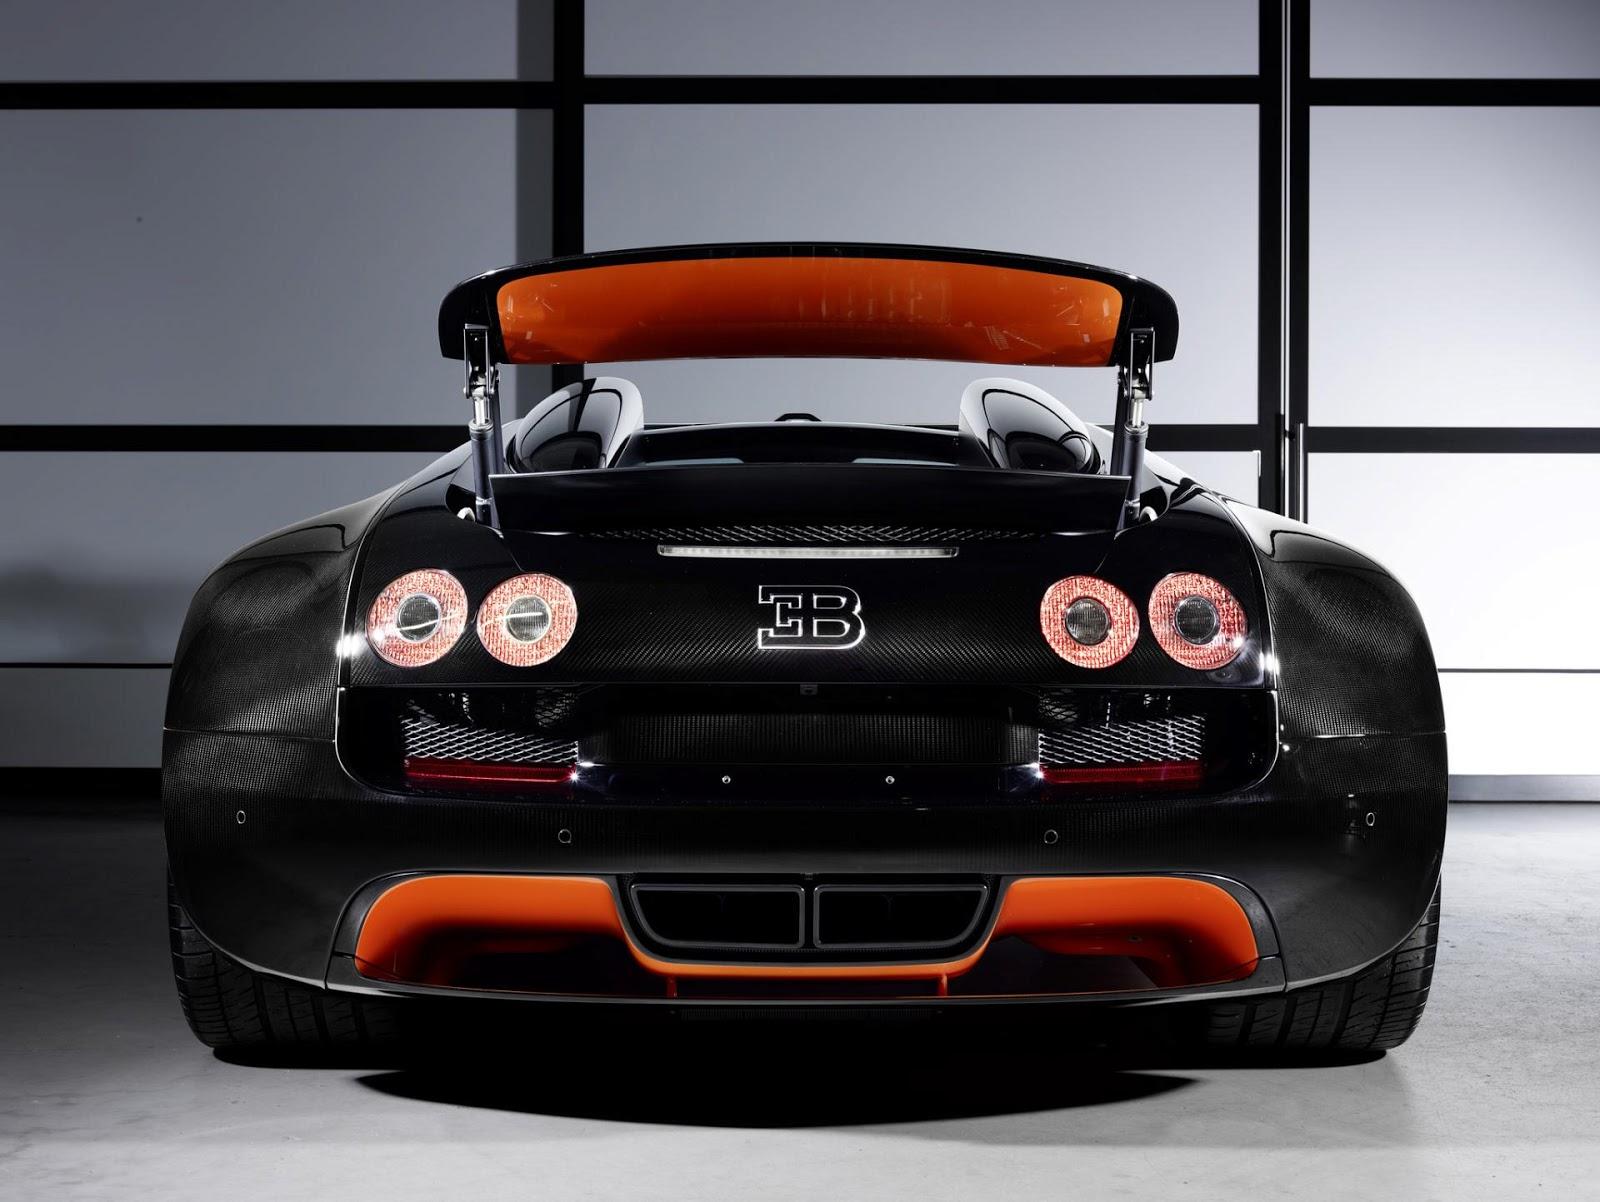 bugatti veyron grand sport vitesse wrc 2013 hottest car. Black Bedroom Furniture Sets. Home Design Ideas